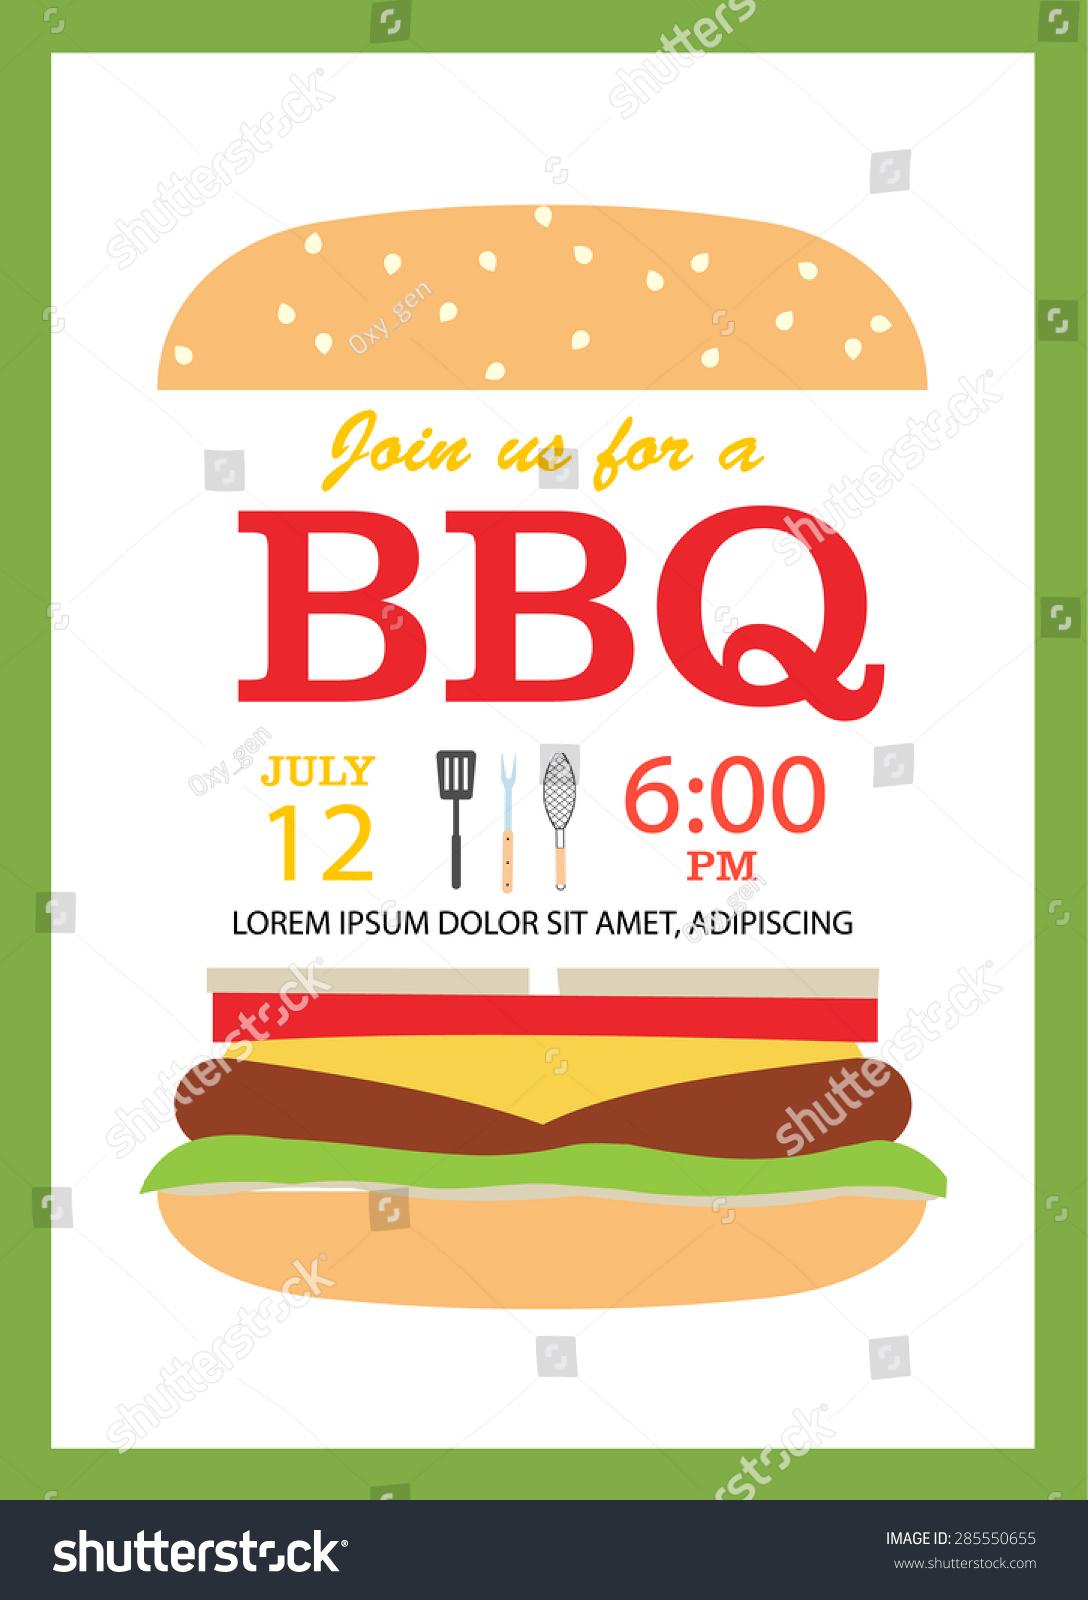 Bbq Party Invitation Card Hamburger Cooking Stock Vector 285550655 ...